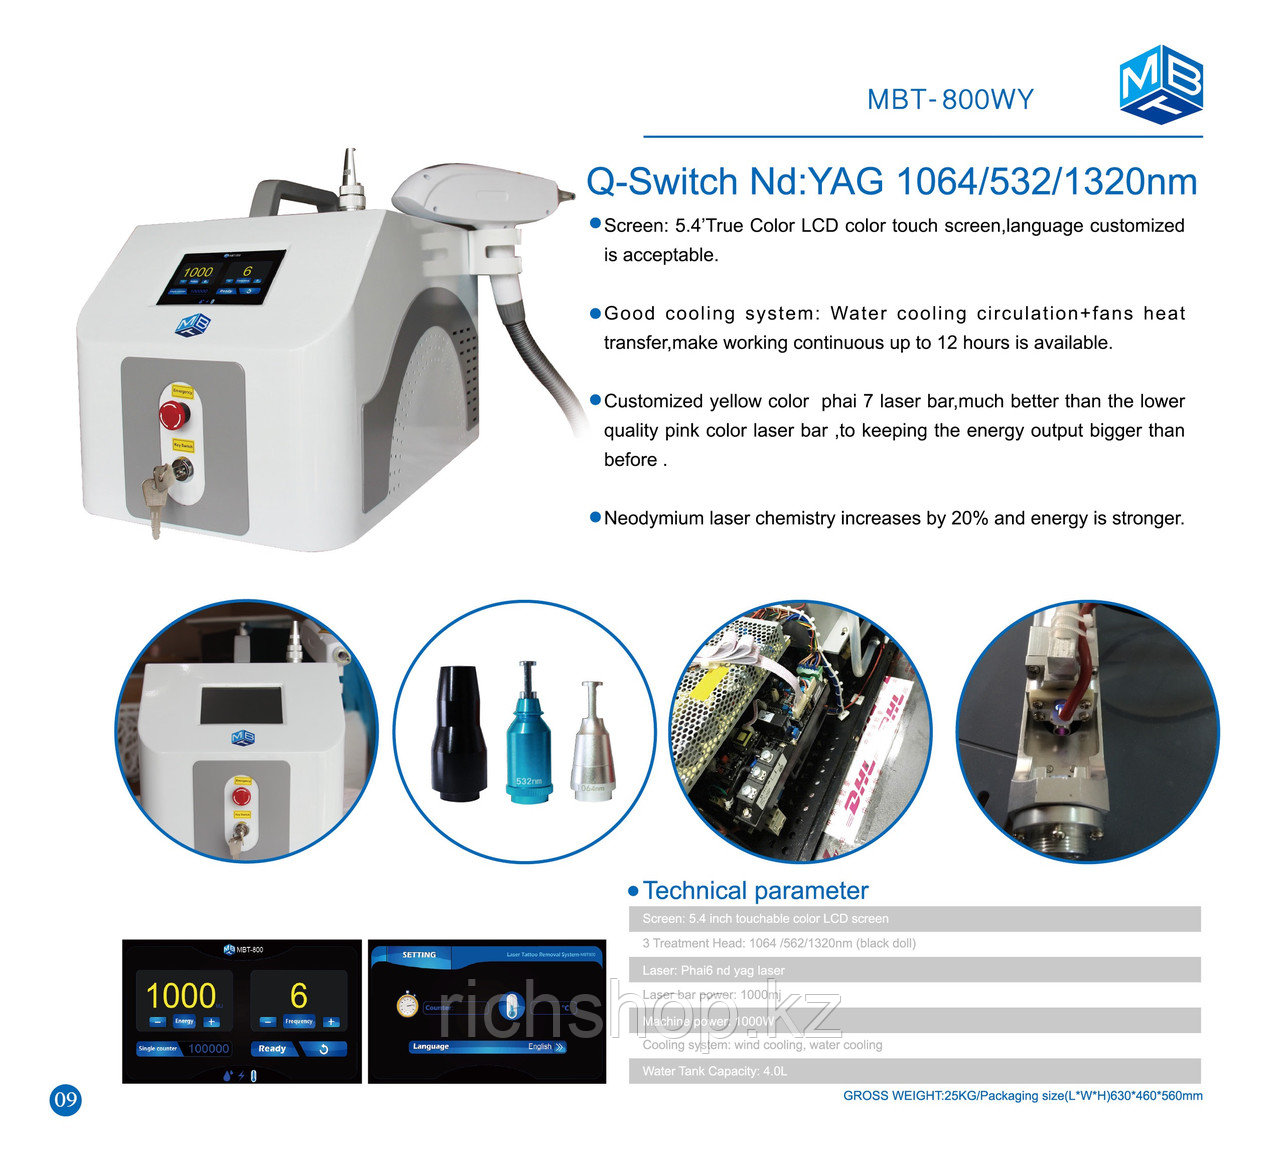 МBТ-800WY Неодимовый Лазер